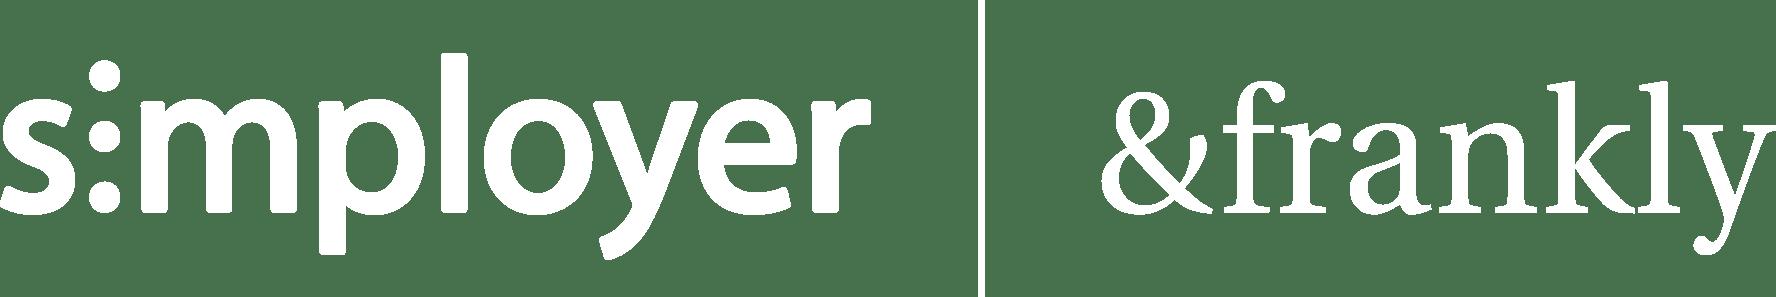 Simployer &frankly logo_white@3x